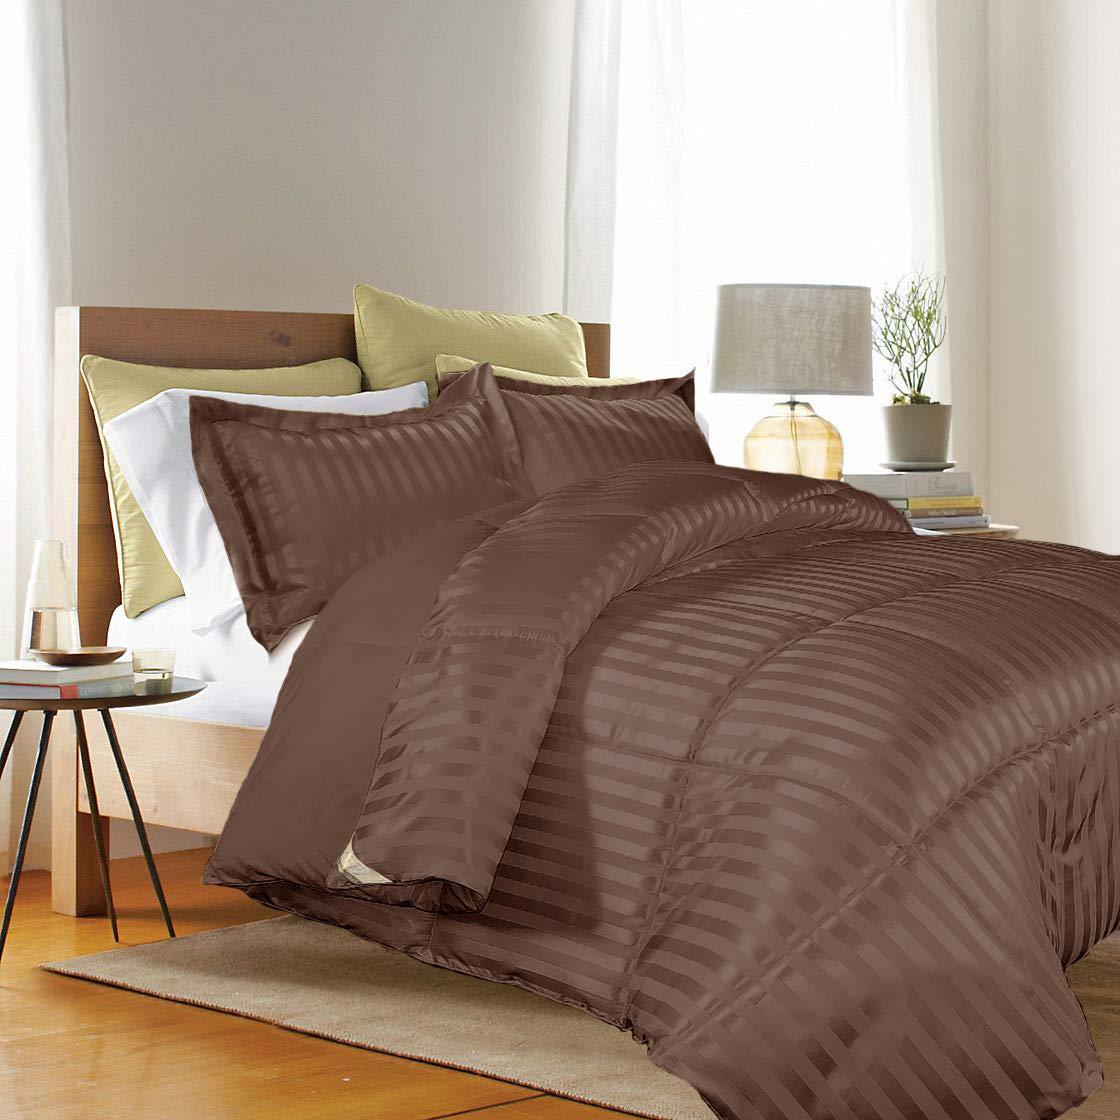 Blue Ridge Home Fashions Kathy Ireland-Essentials Microfiber Damask Stripe/Solid 3-PC Reversible Down Alternative Set Twin in Chocolate Color Comforter